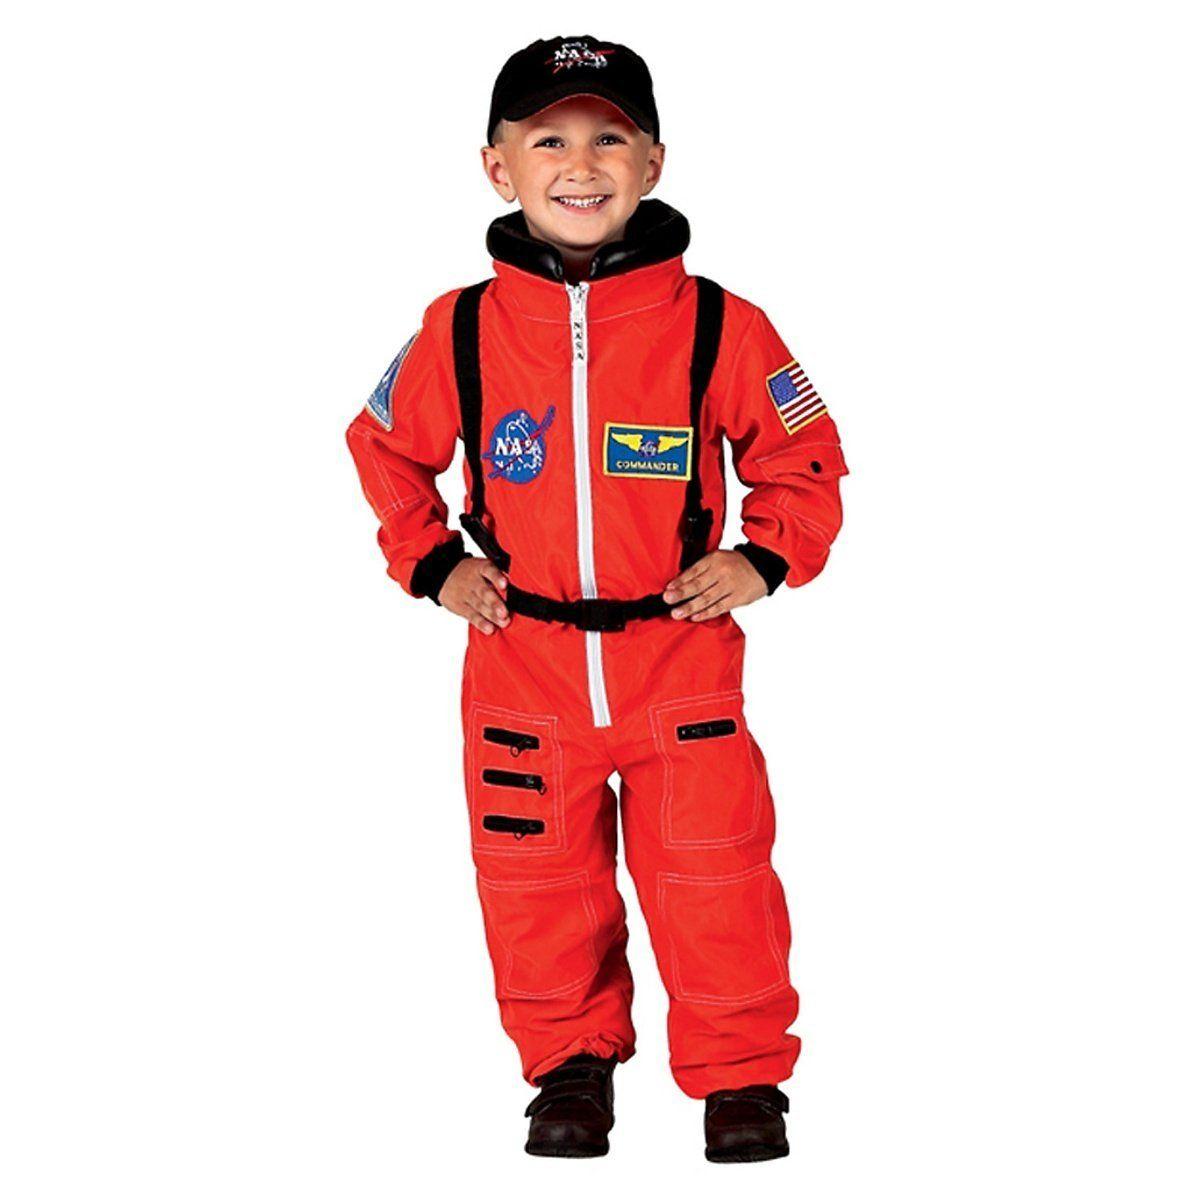 Astronaut costume - Cosmonaut Outfit - Google Search Cosmonaut Costume Pinterest